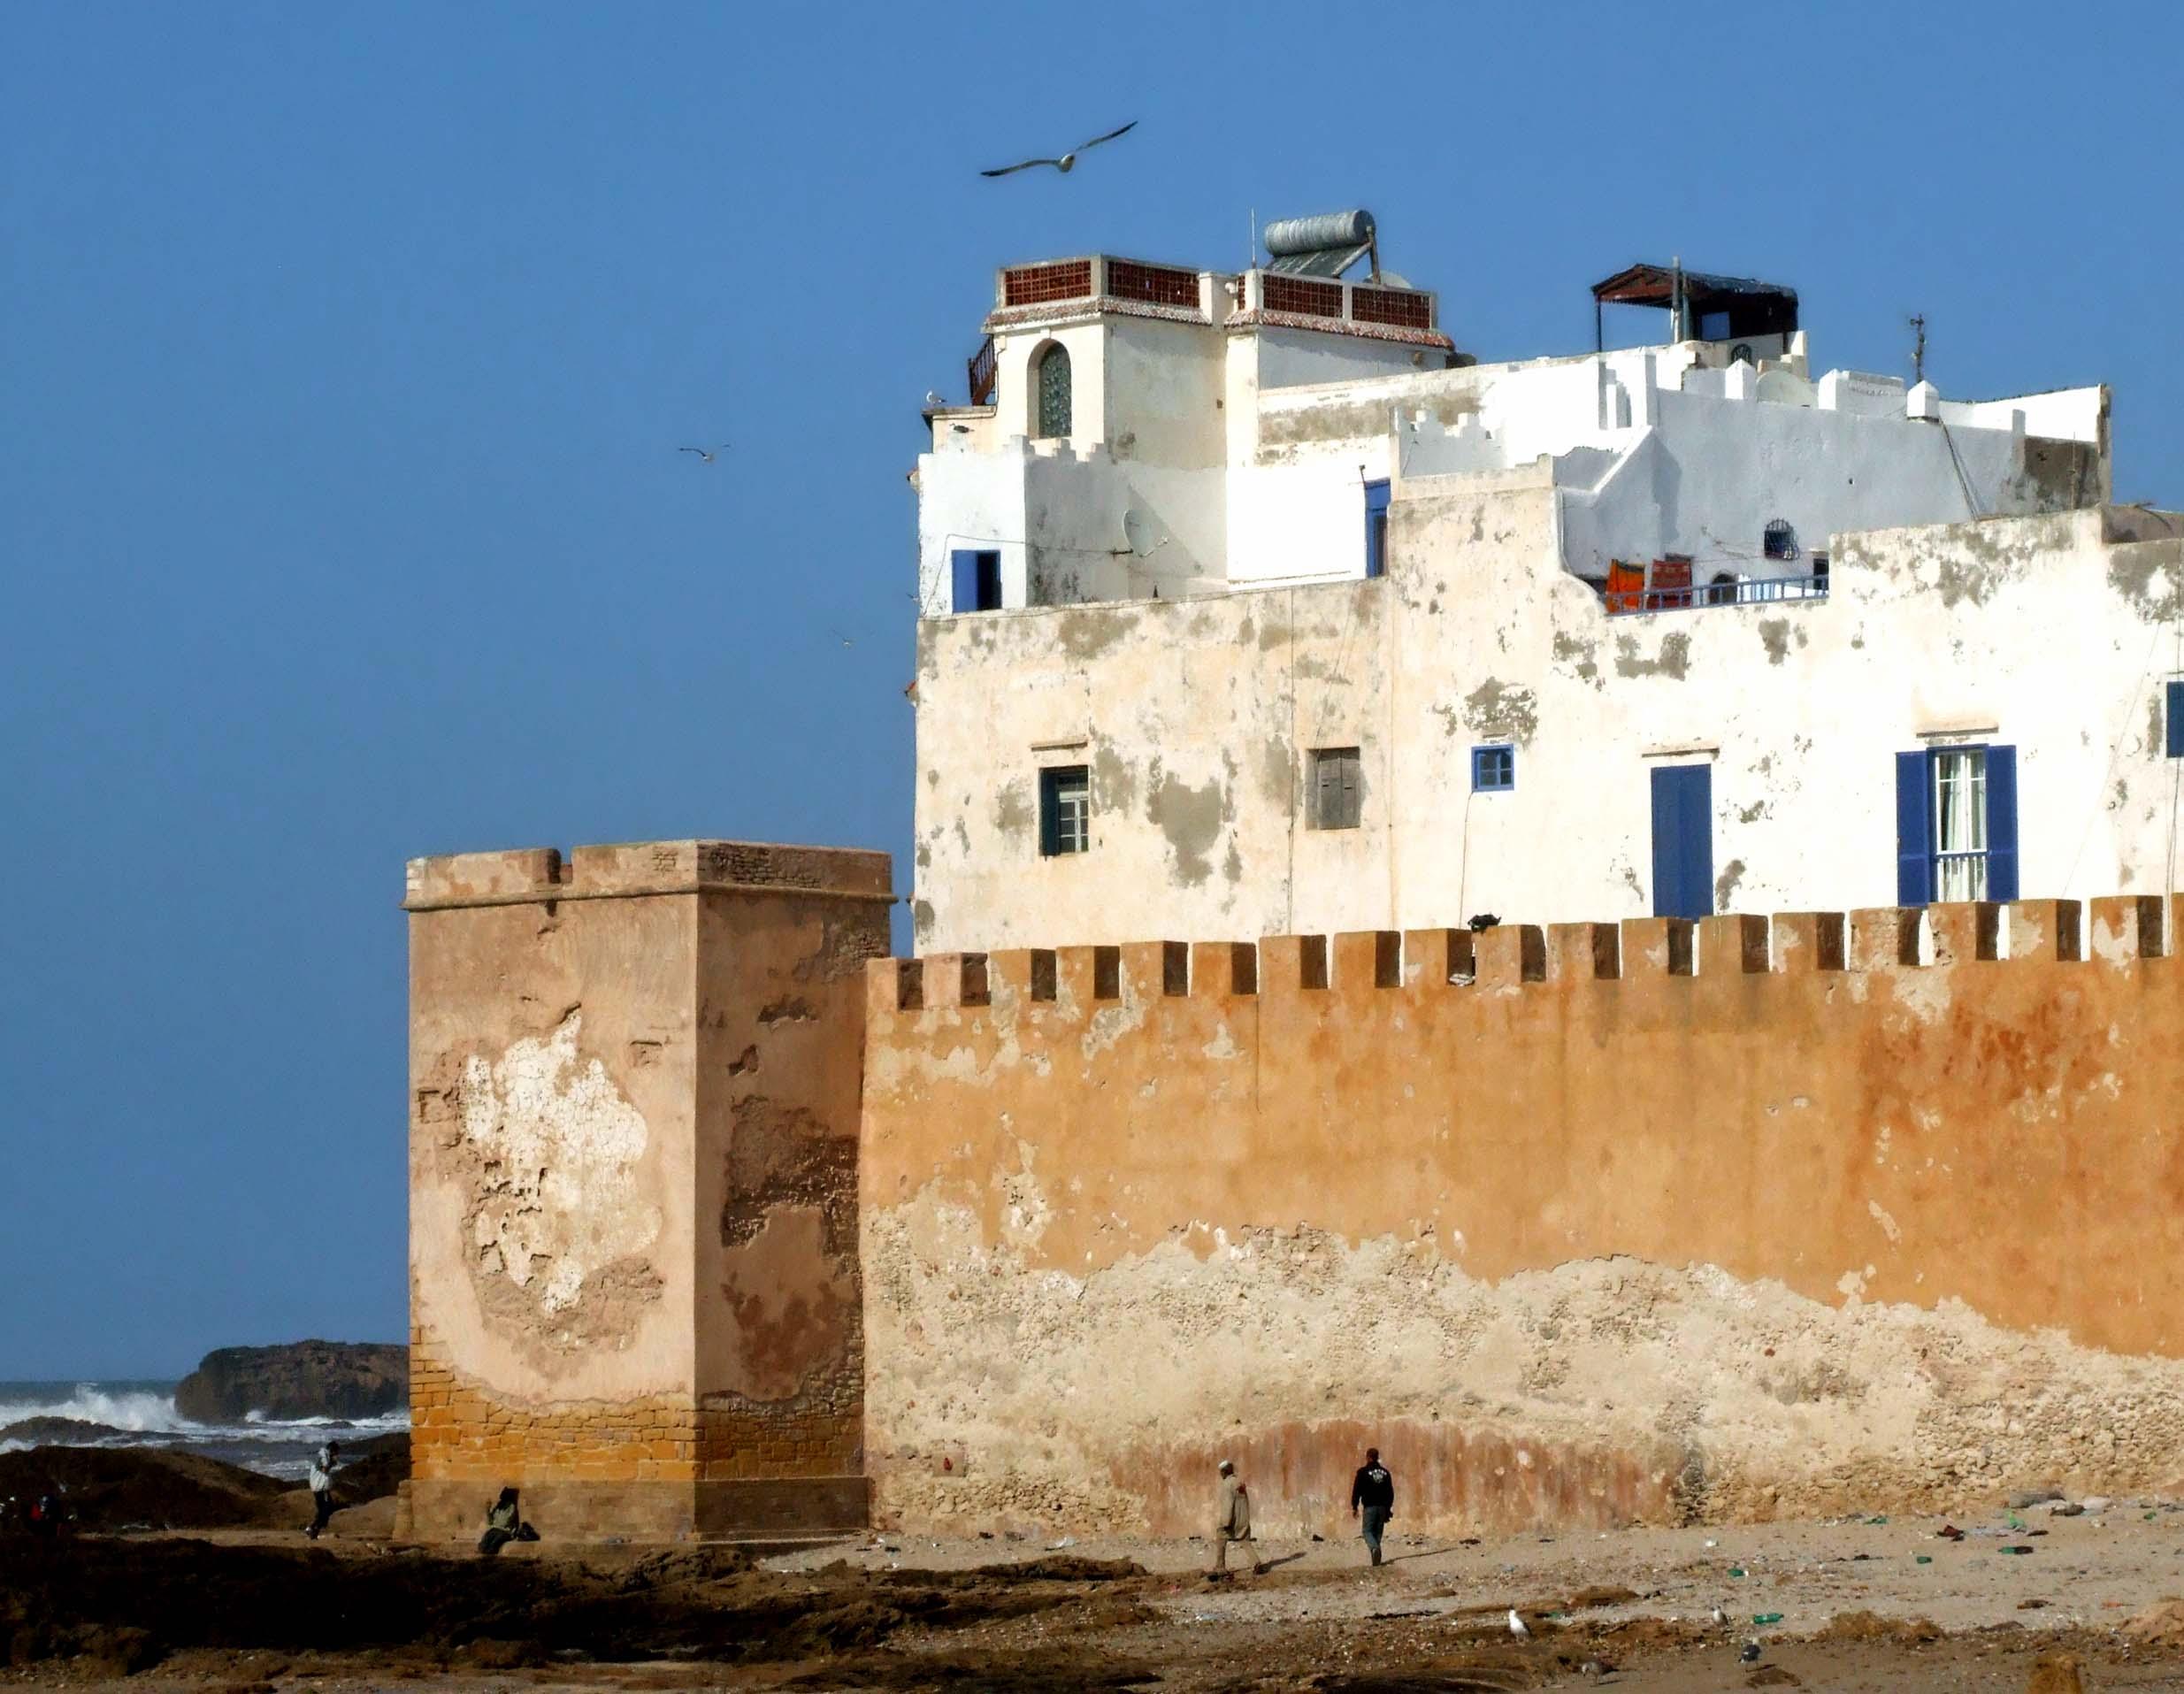 White houses above battlements